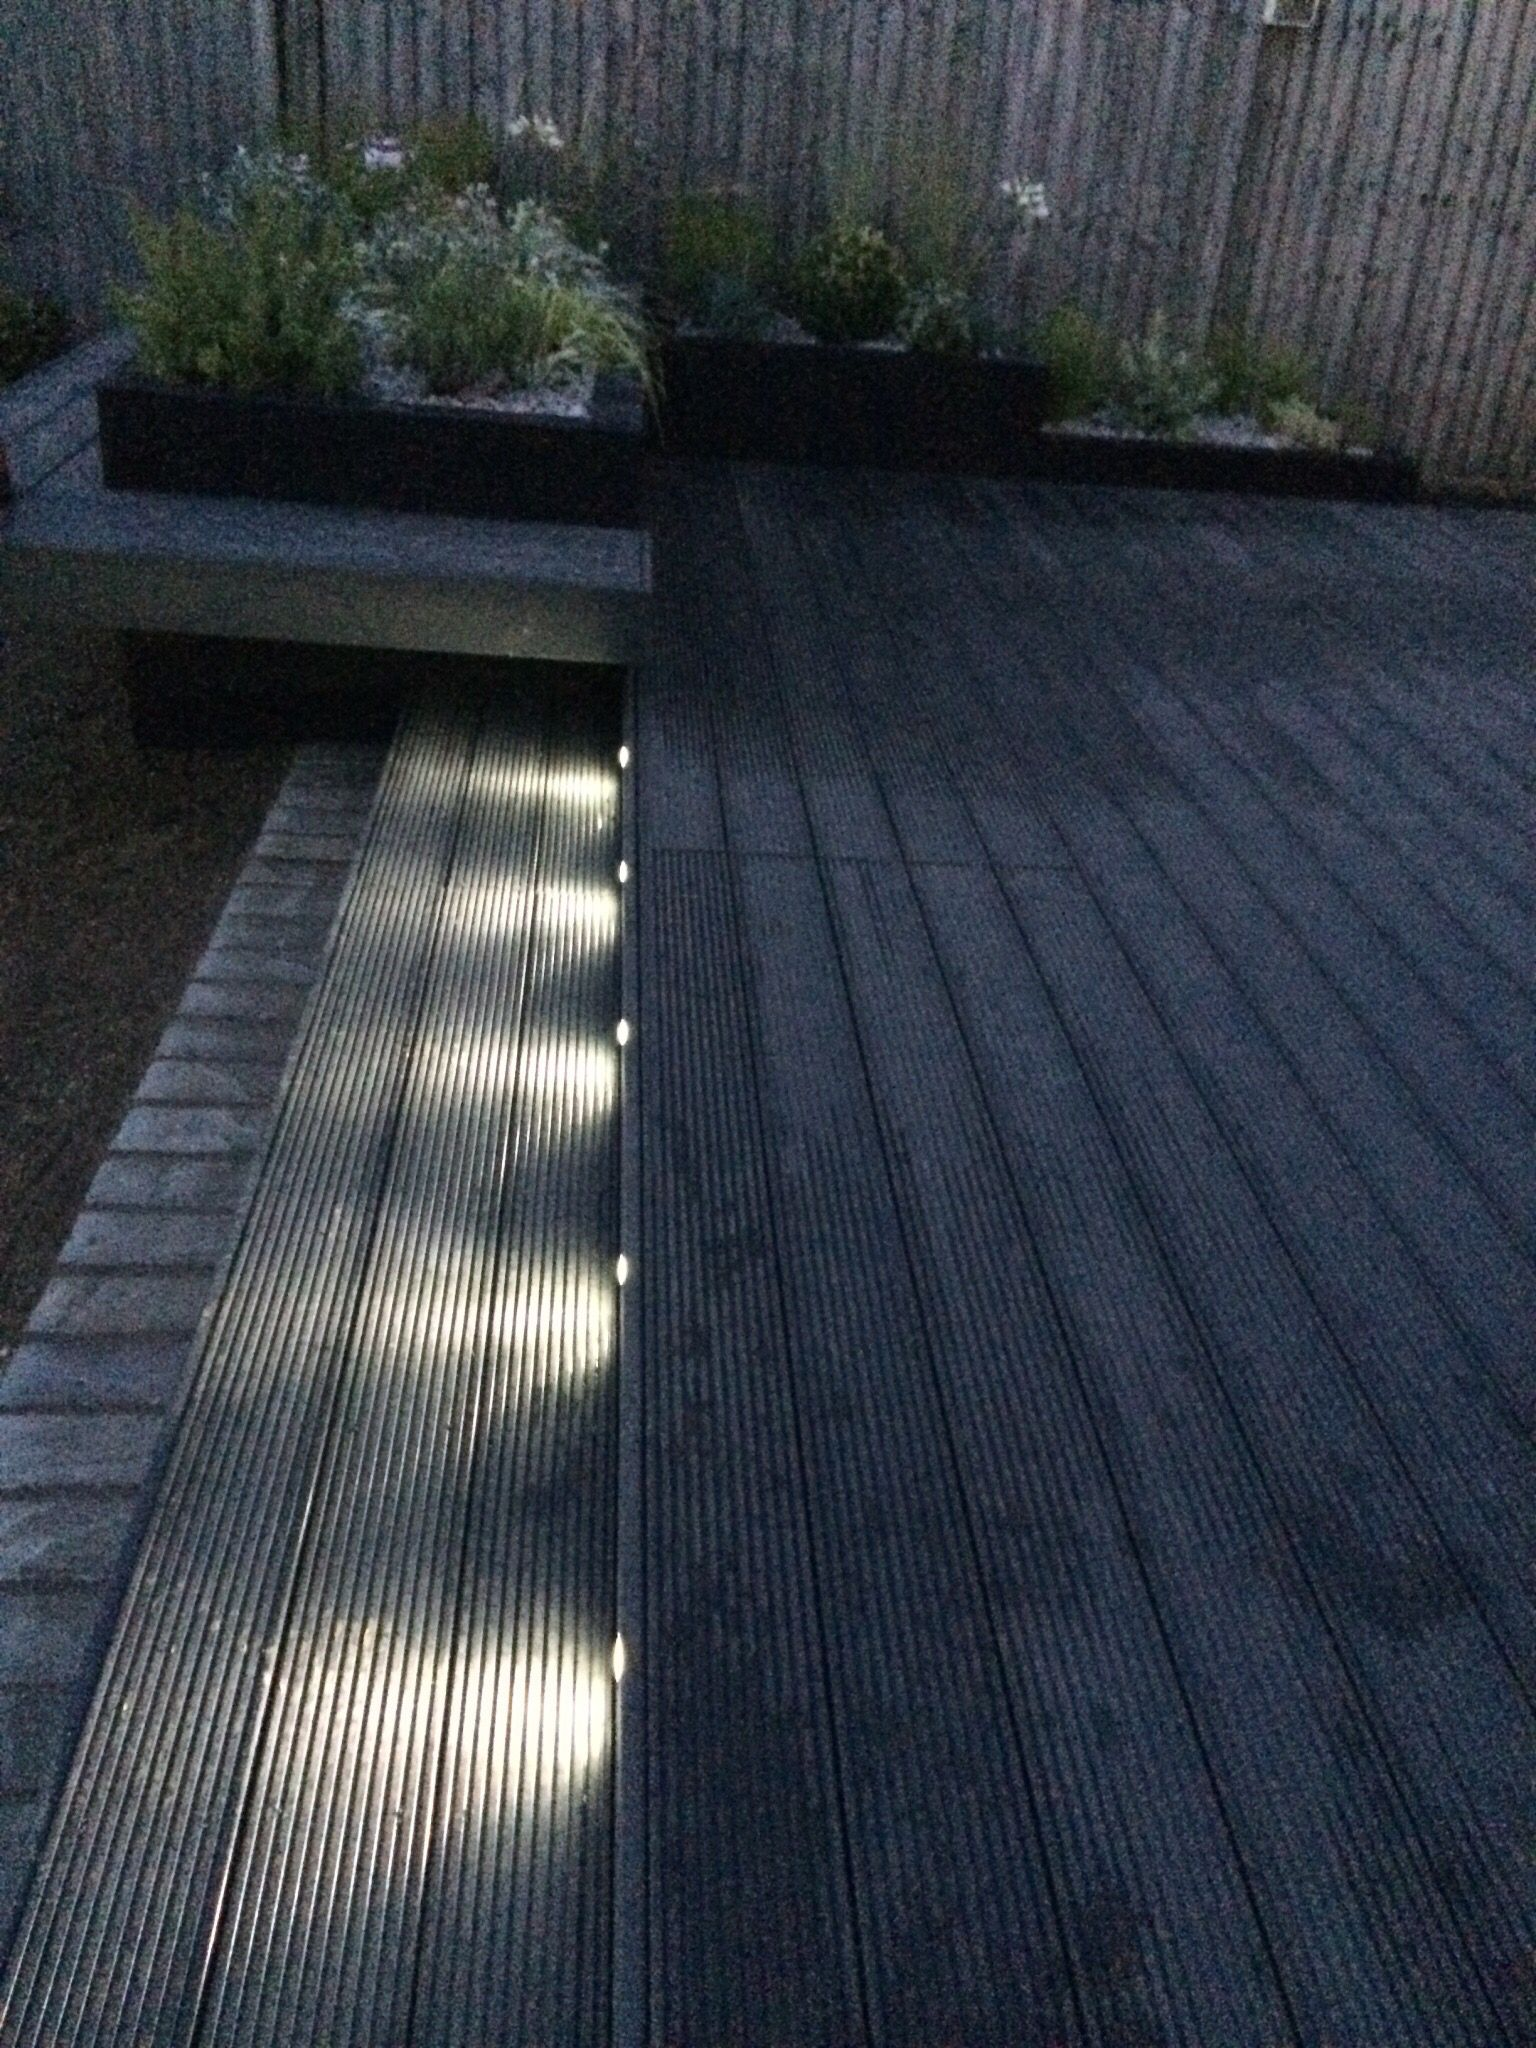 Funky led garden lights composite decking in dark grey for Grey composite decking